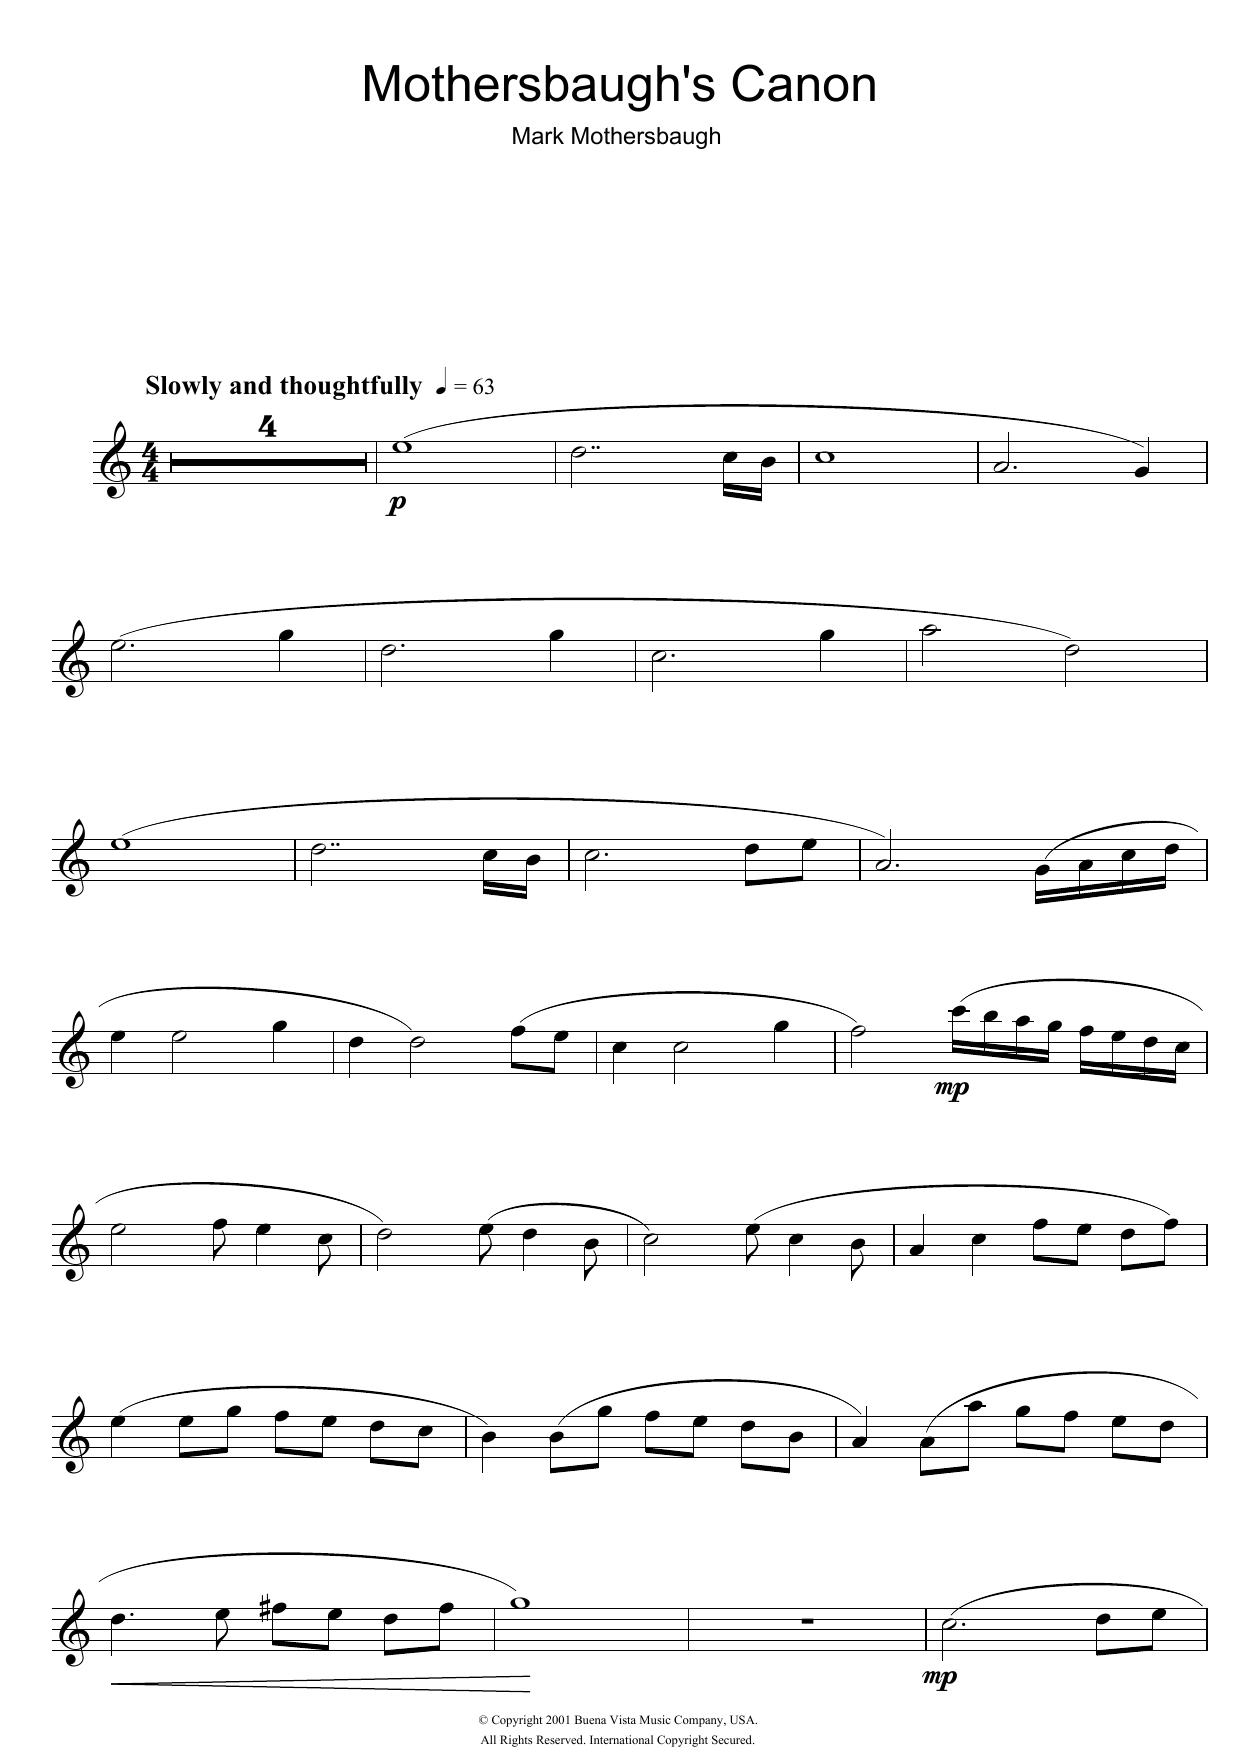 Mark Mothersbaugh - Mothersbaugh's Canon (from The Royal Tenenbaums)